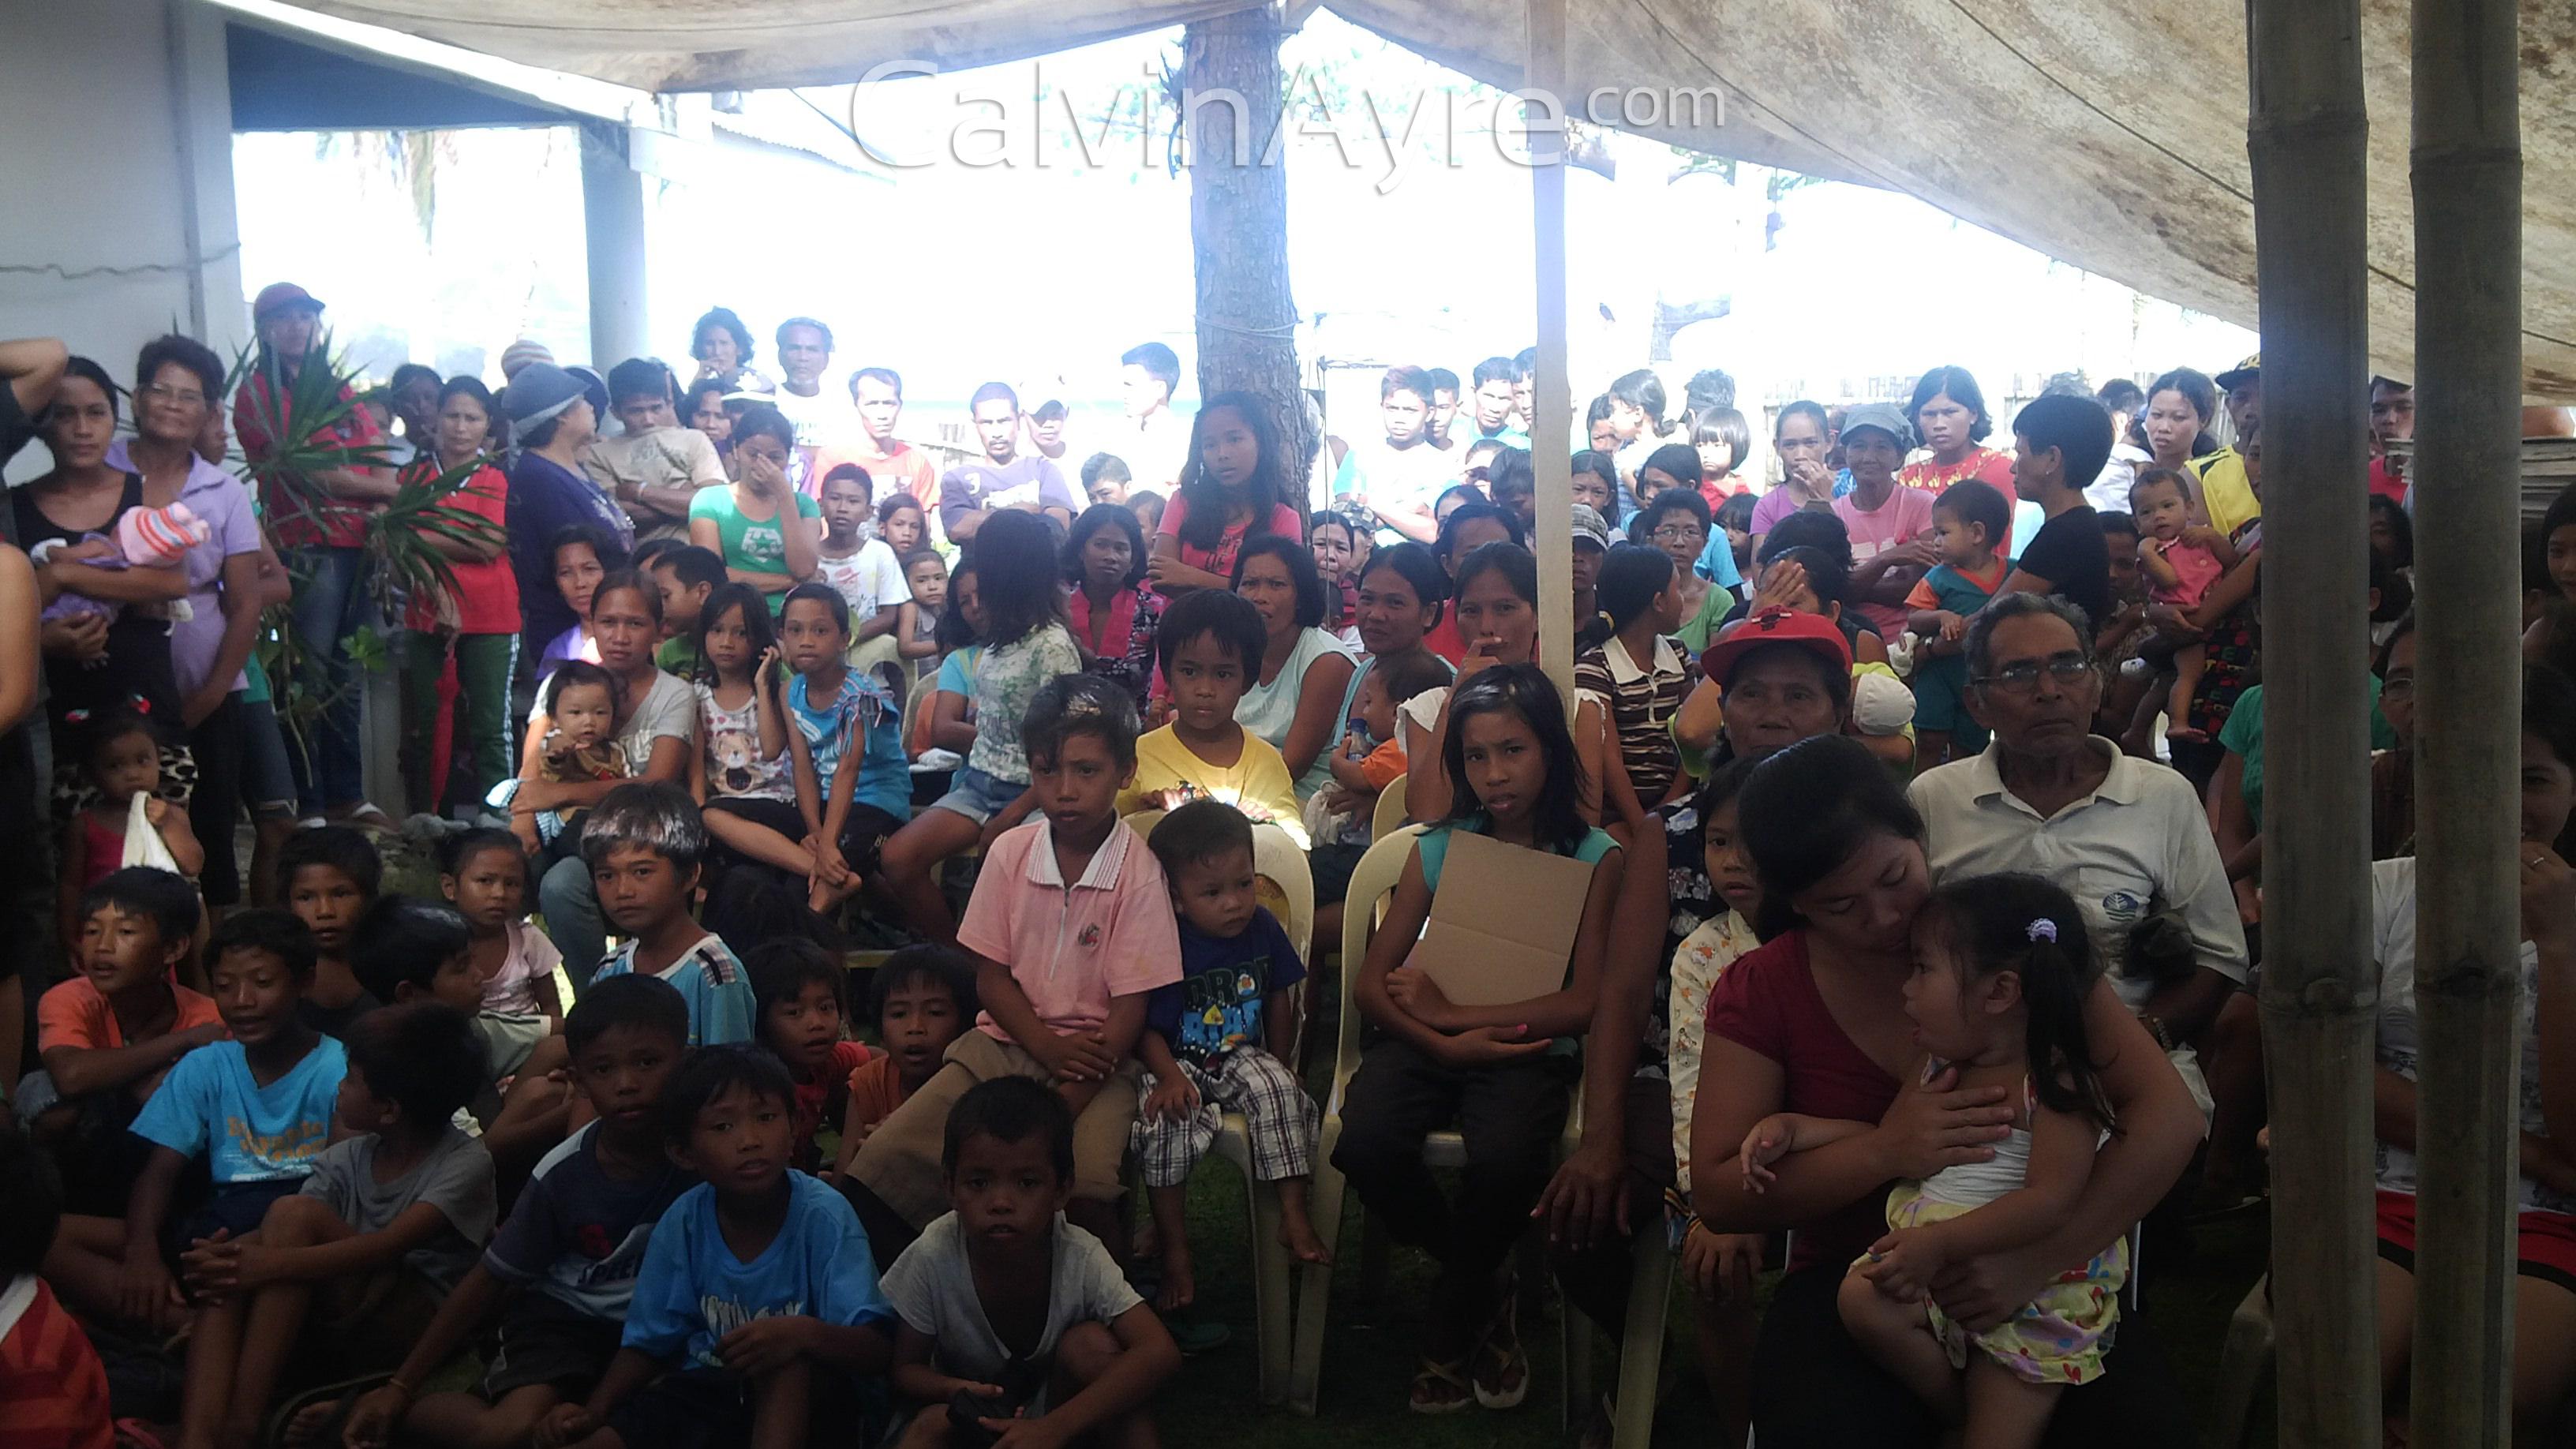 calvin-ayre-foundation-typhoon-relief-updates-4